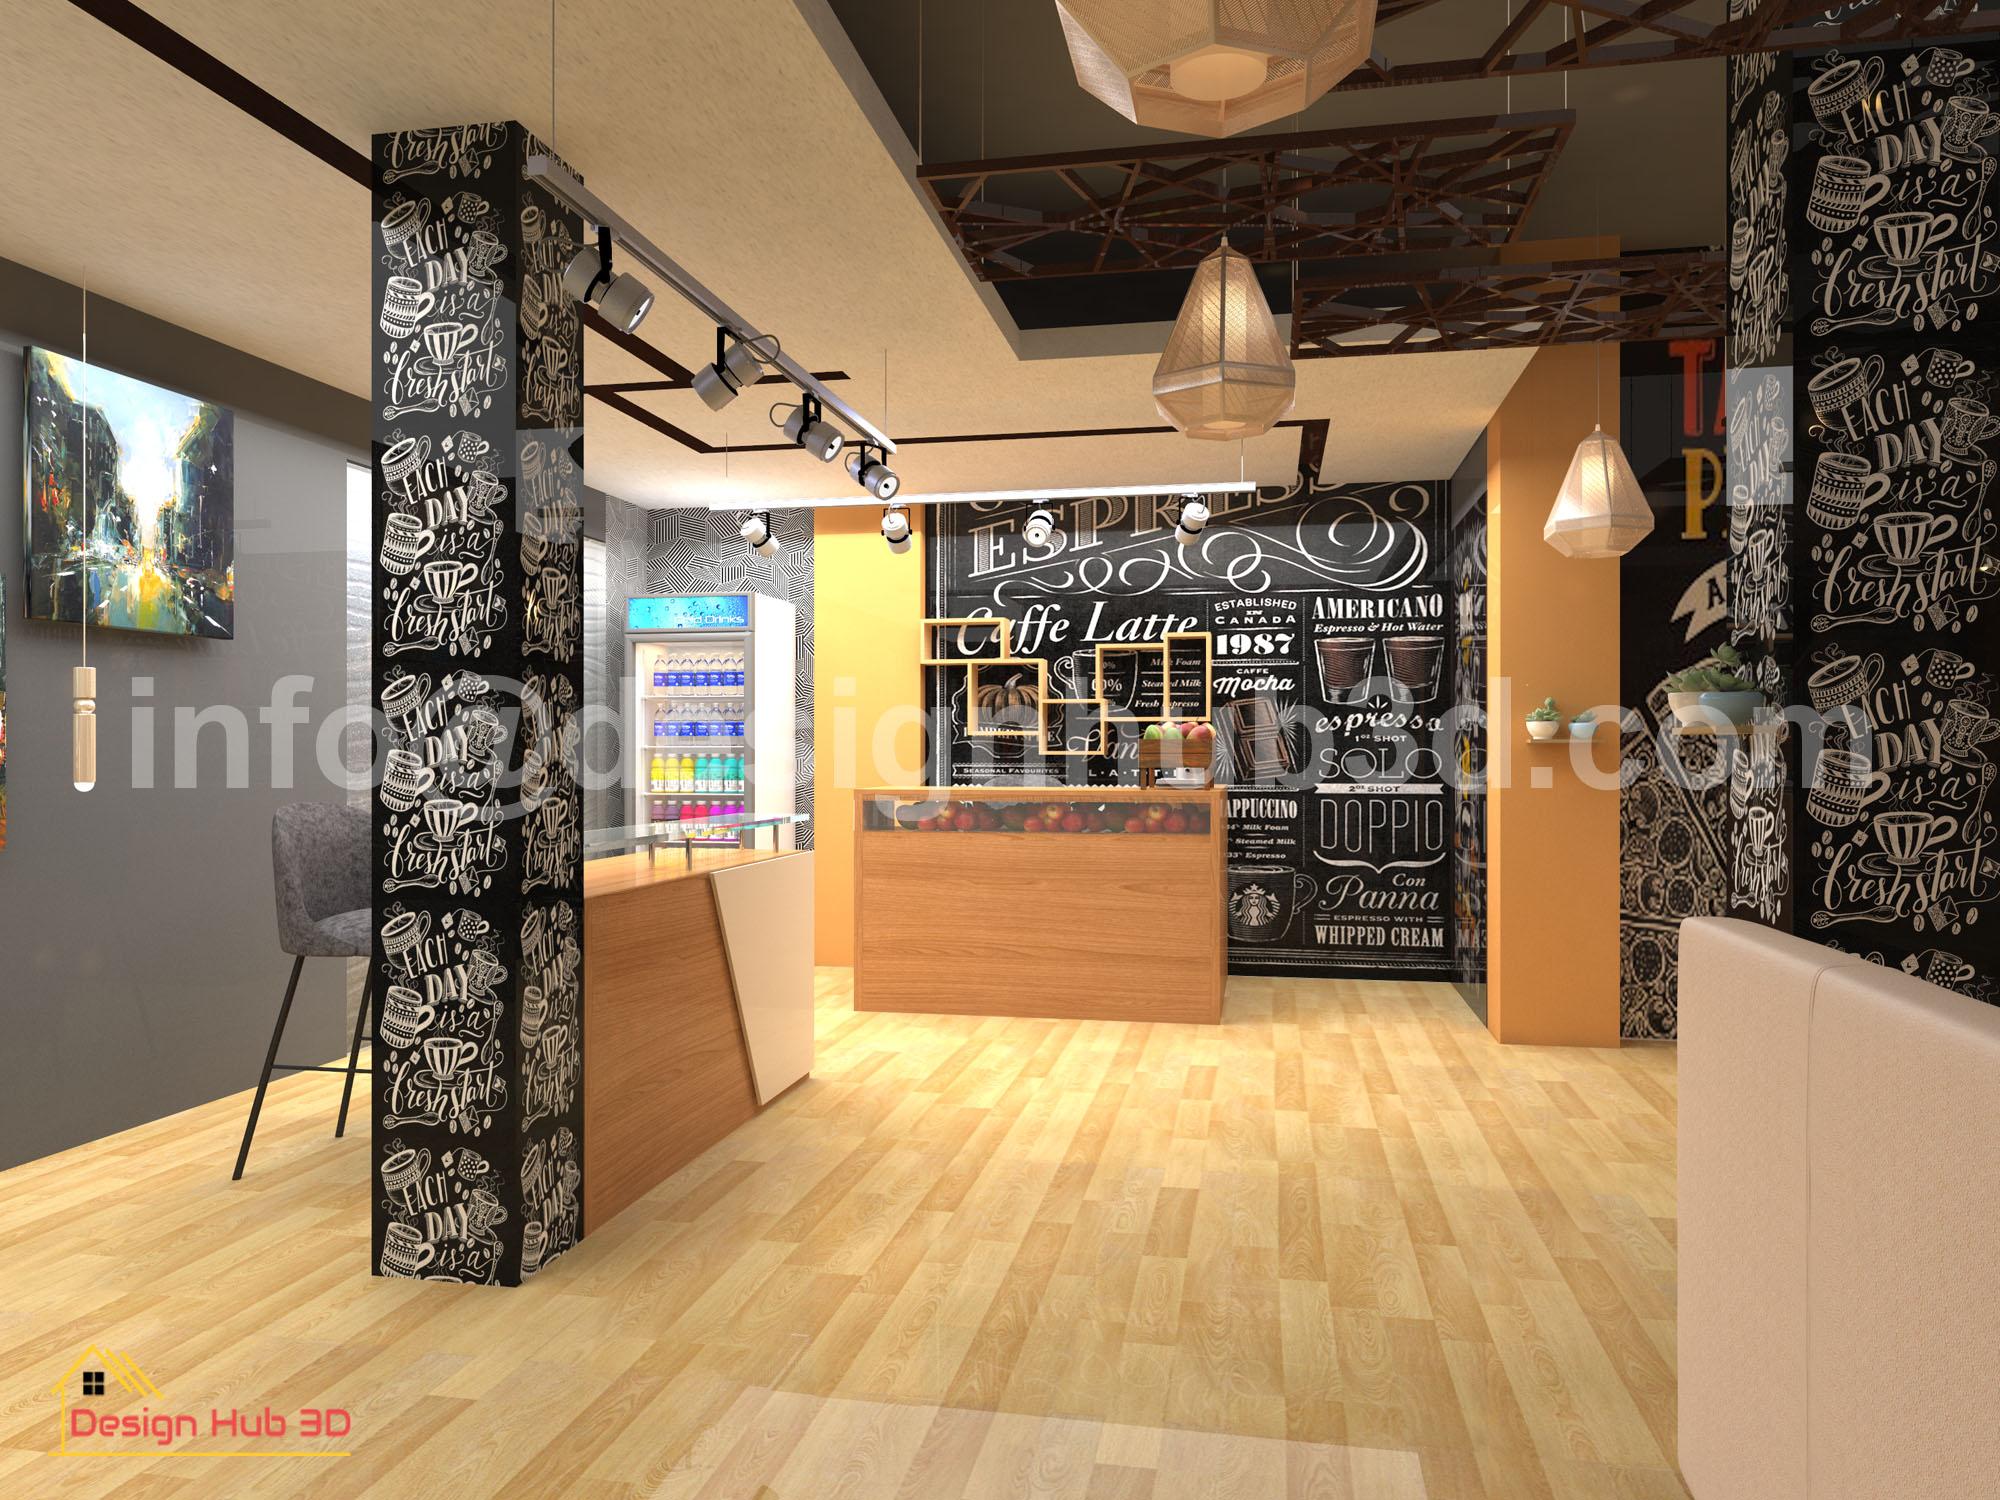 DesignHub 3D-Restaurant Top view, Restaurant interior, Restaurant Decor